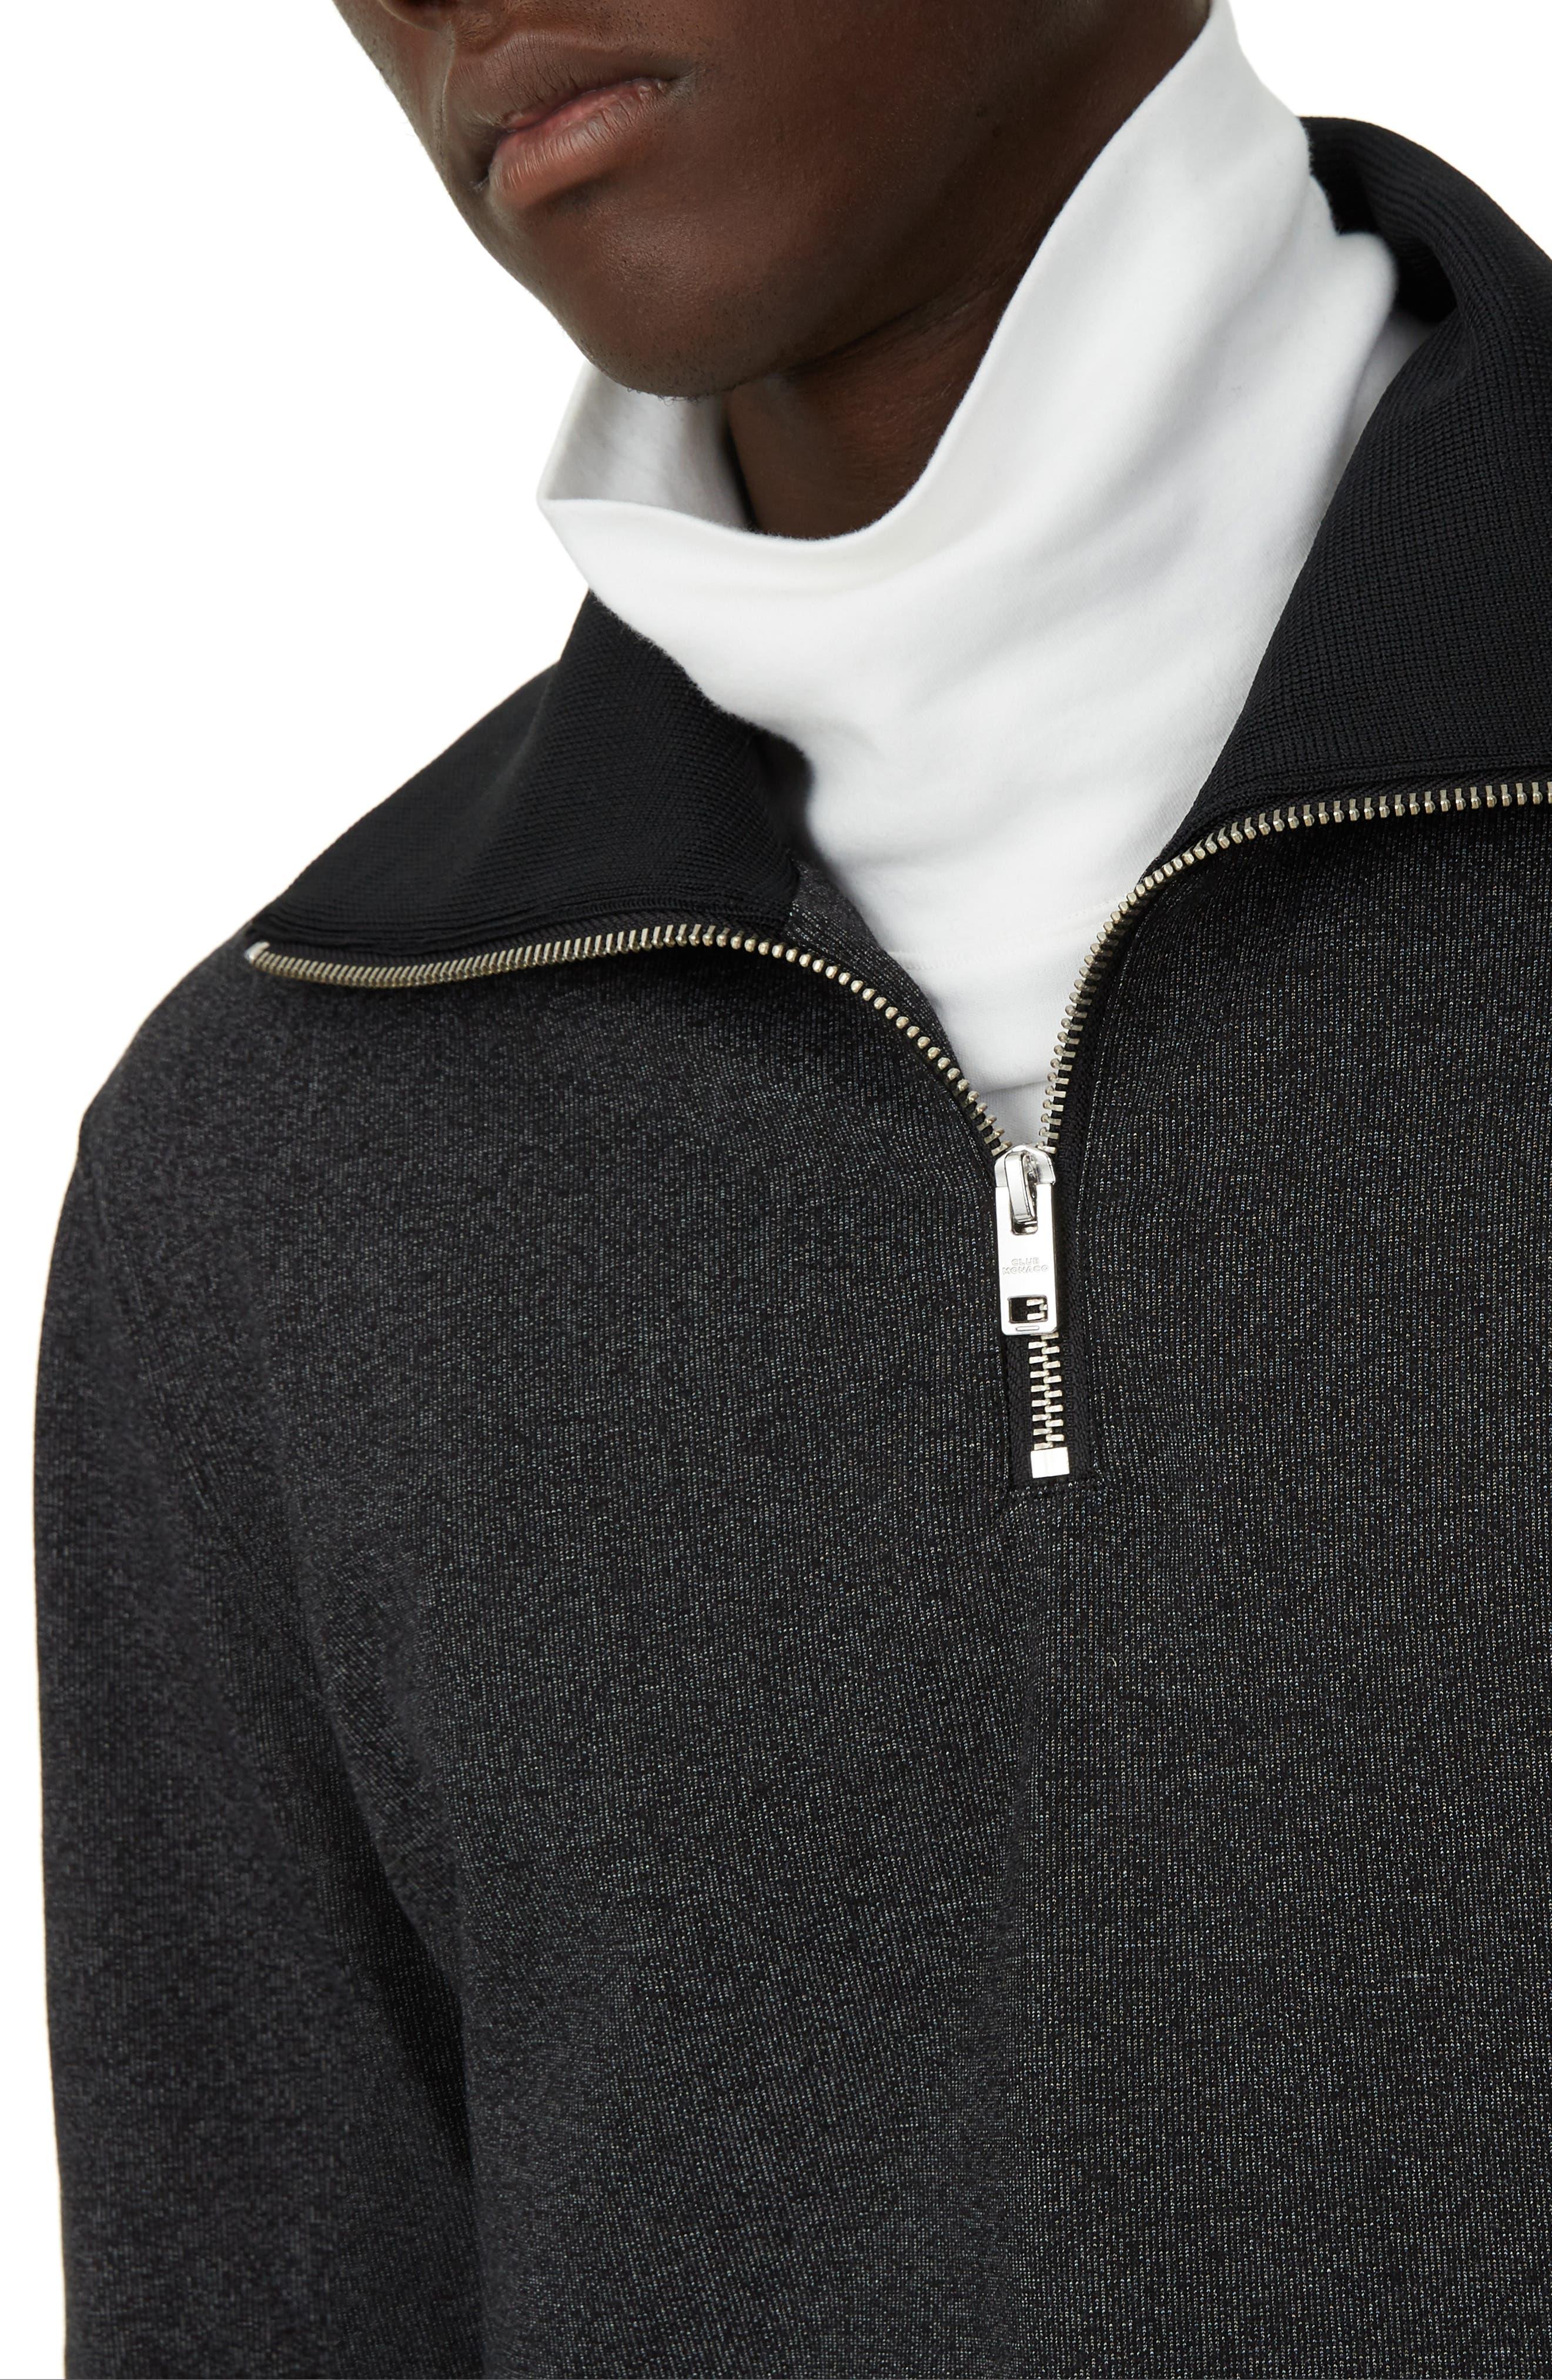 Trim Fit Quarter Zip Pullover,                             Alternate thumbnail 3, color,                             GREY